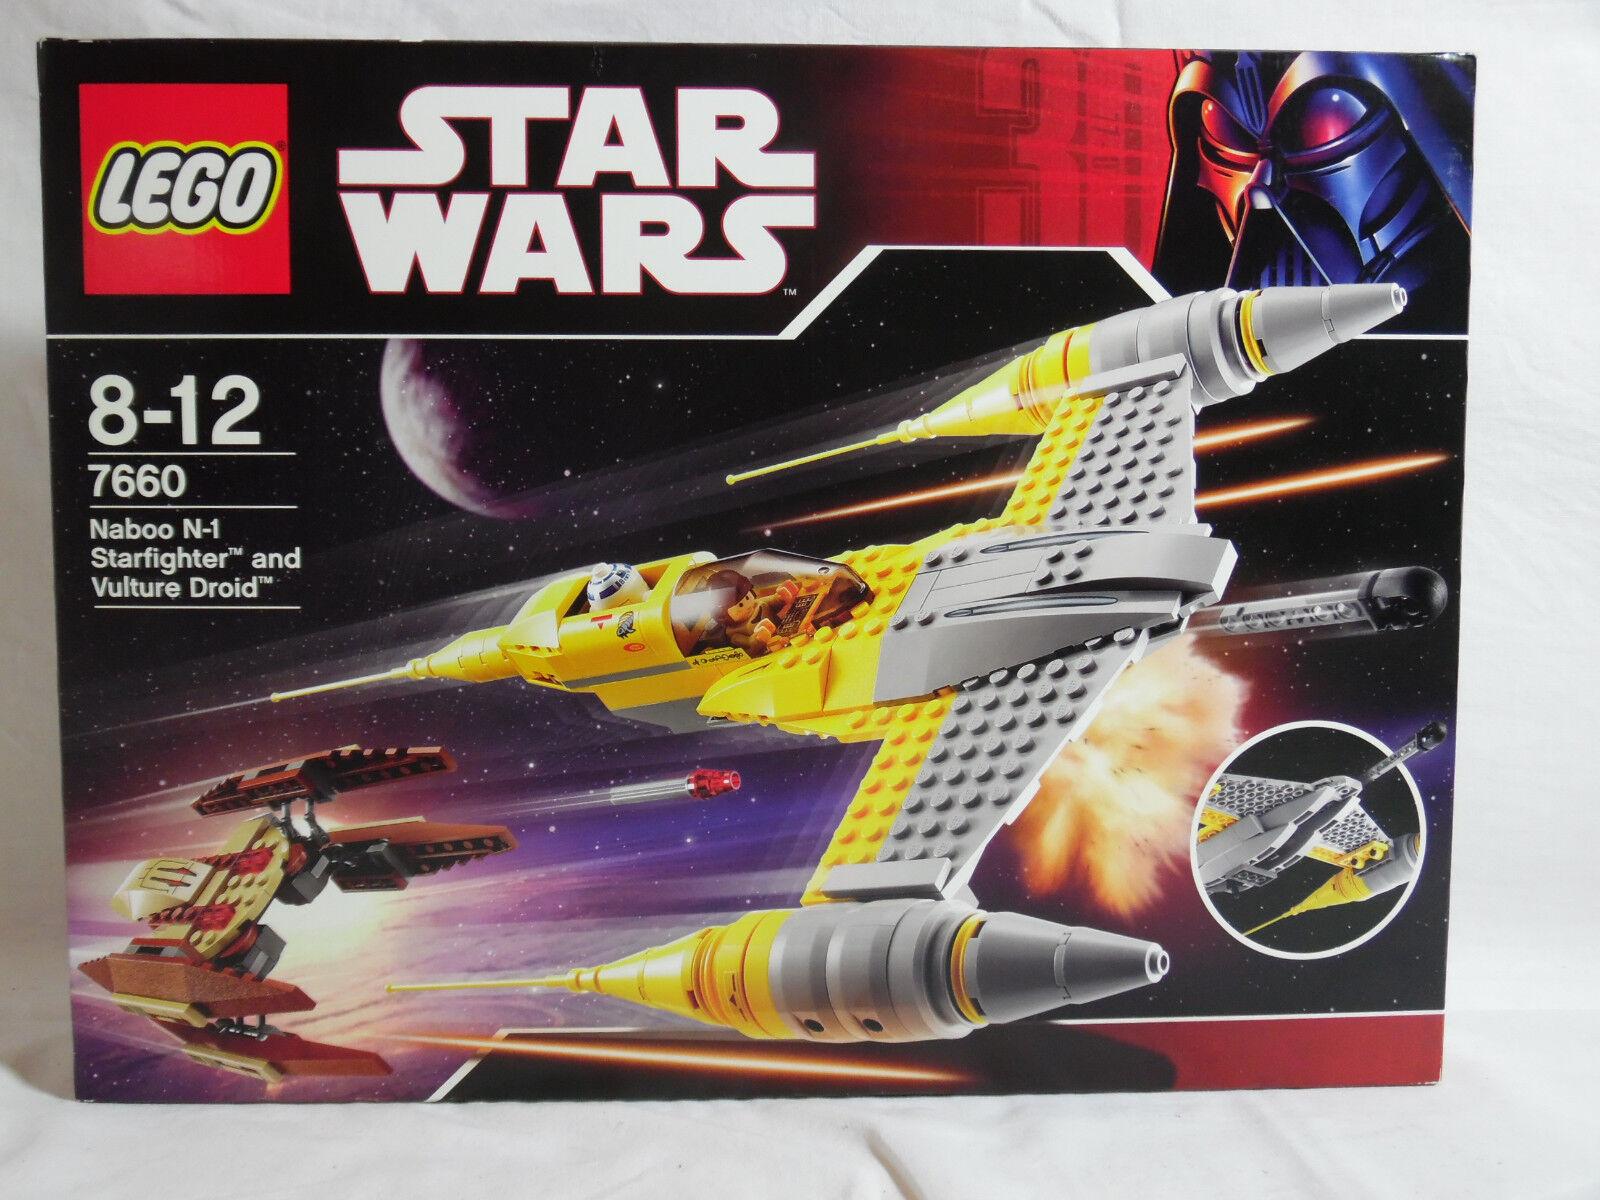 LEGO Star Wars / Naboo N-1 Starfighter and Vulture Droid / 7660 / Neu und OVP